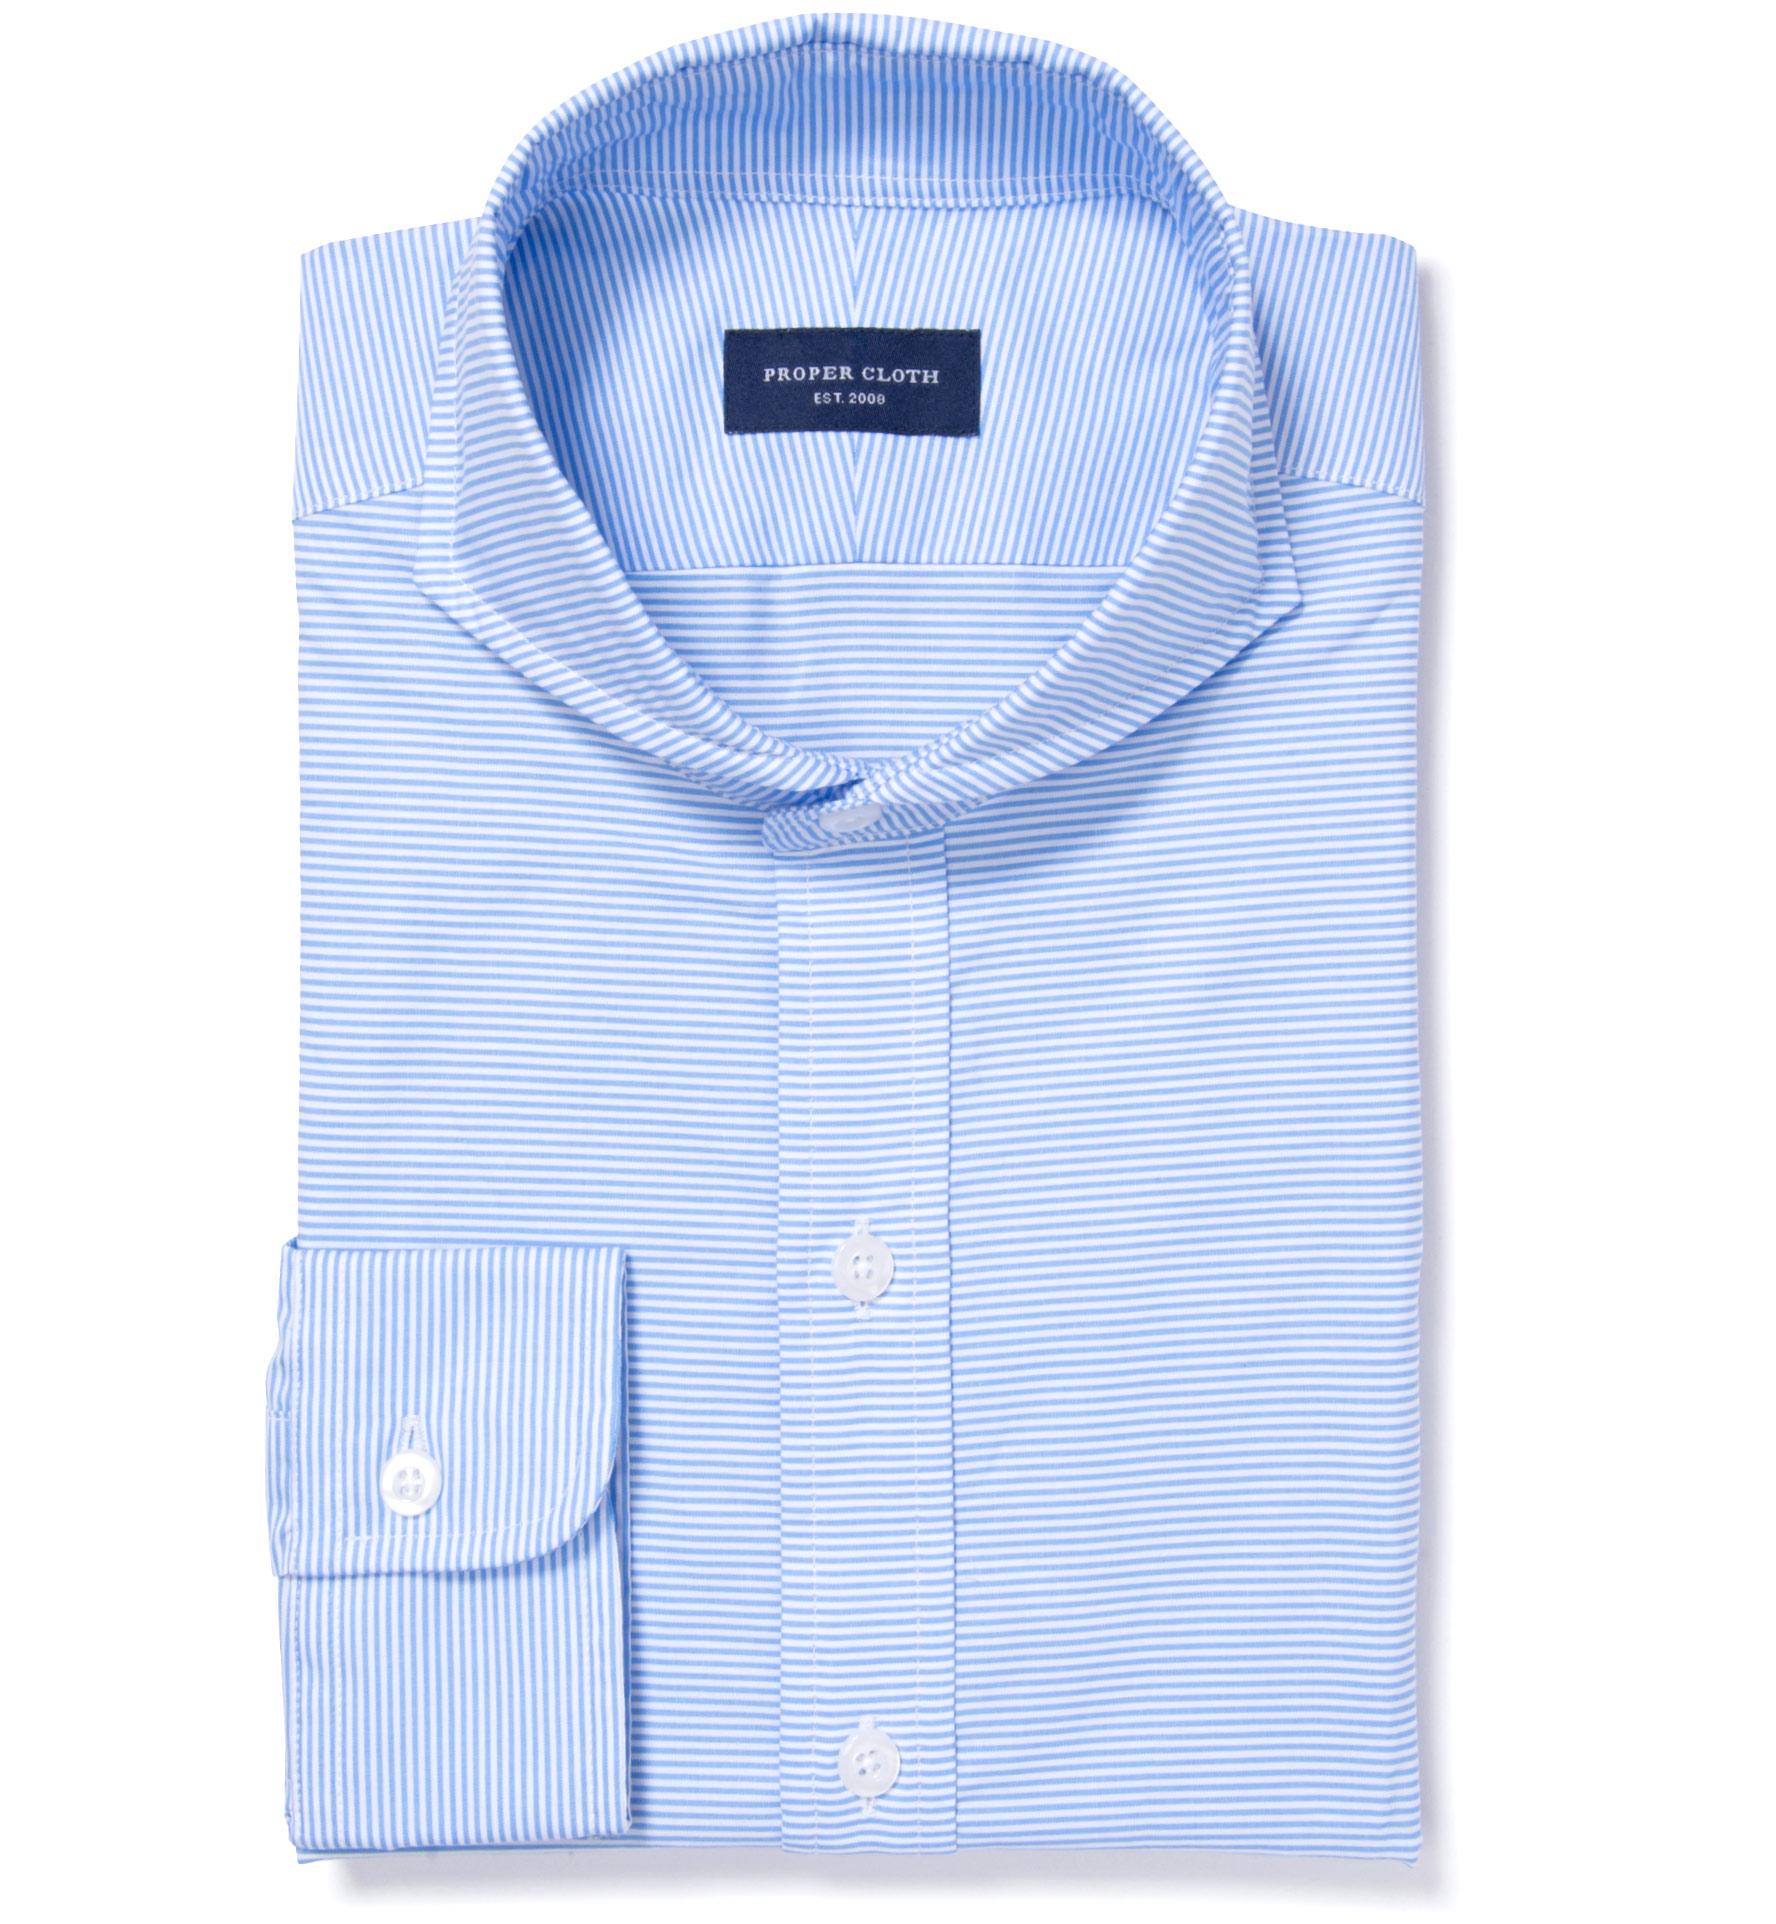 Carmine light blue horizontal stripe men 39 s dress shirt by for Horizontal striped dress shirts men